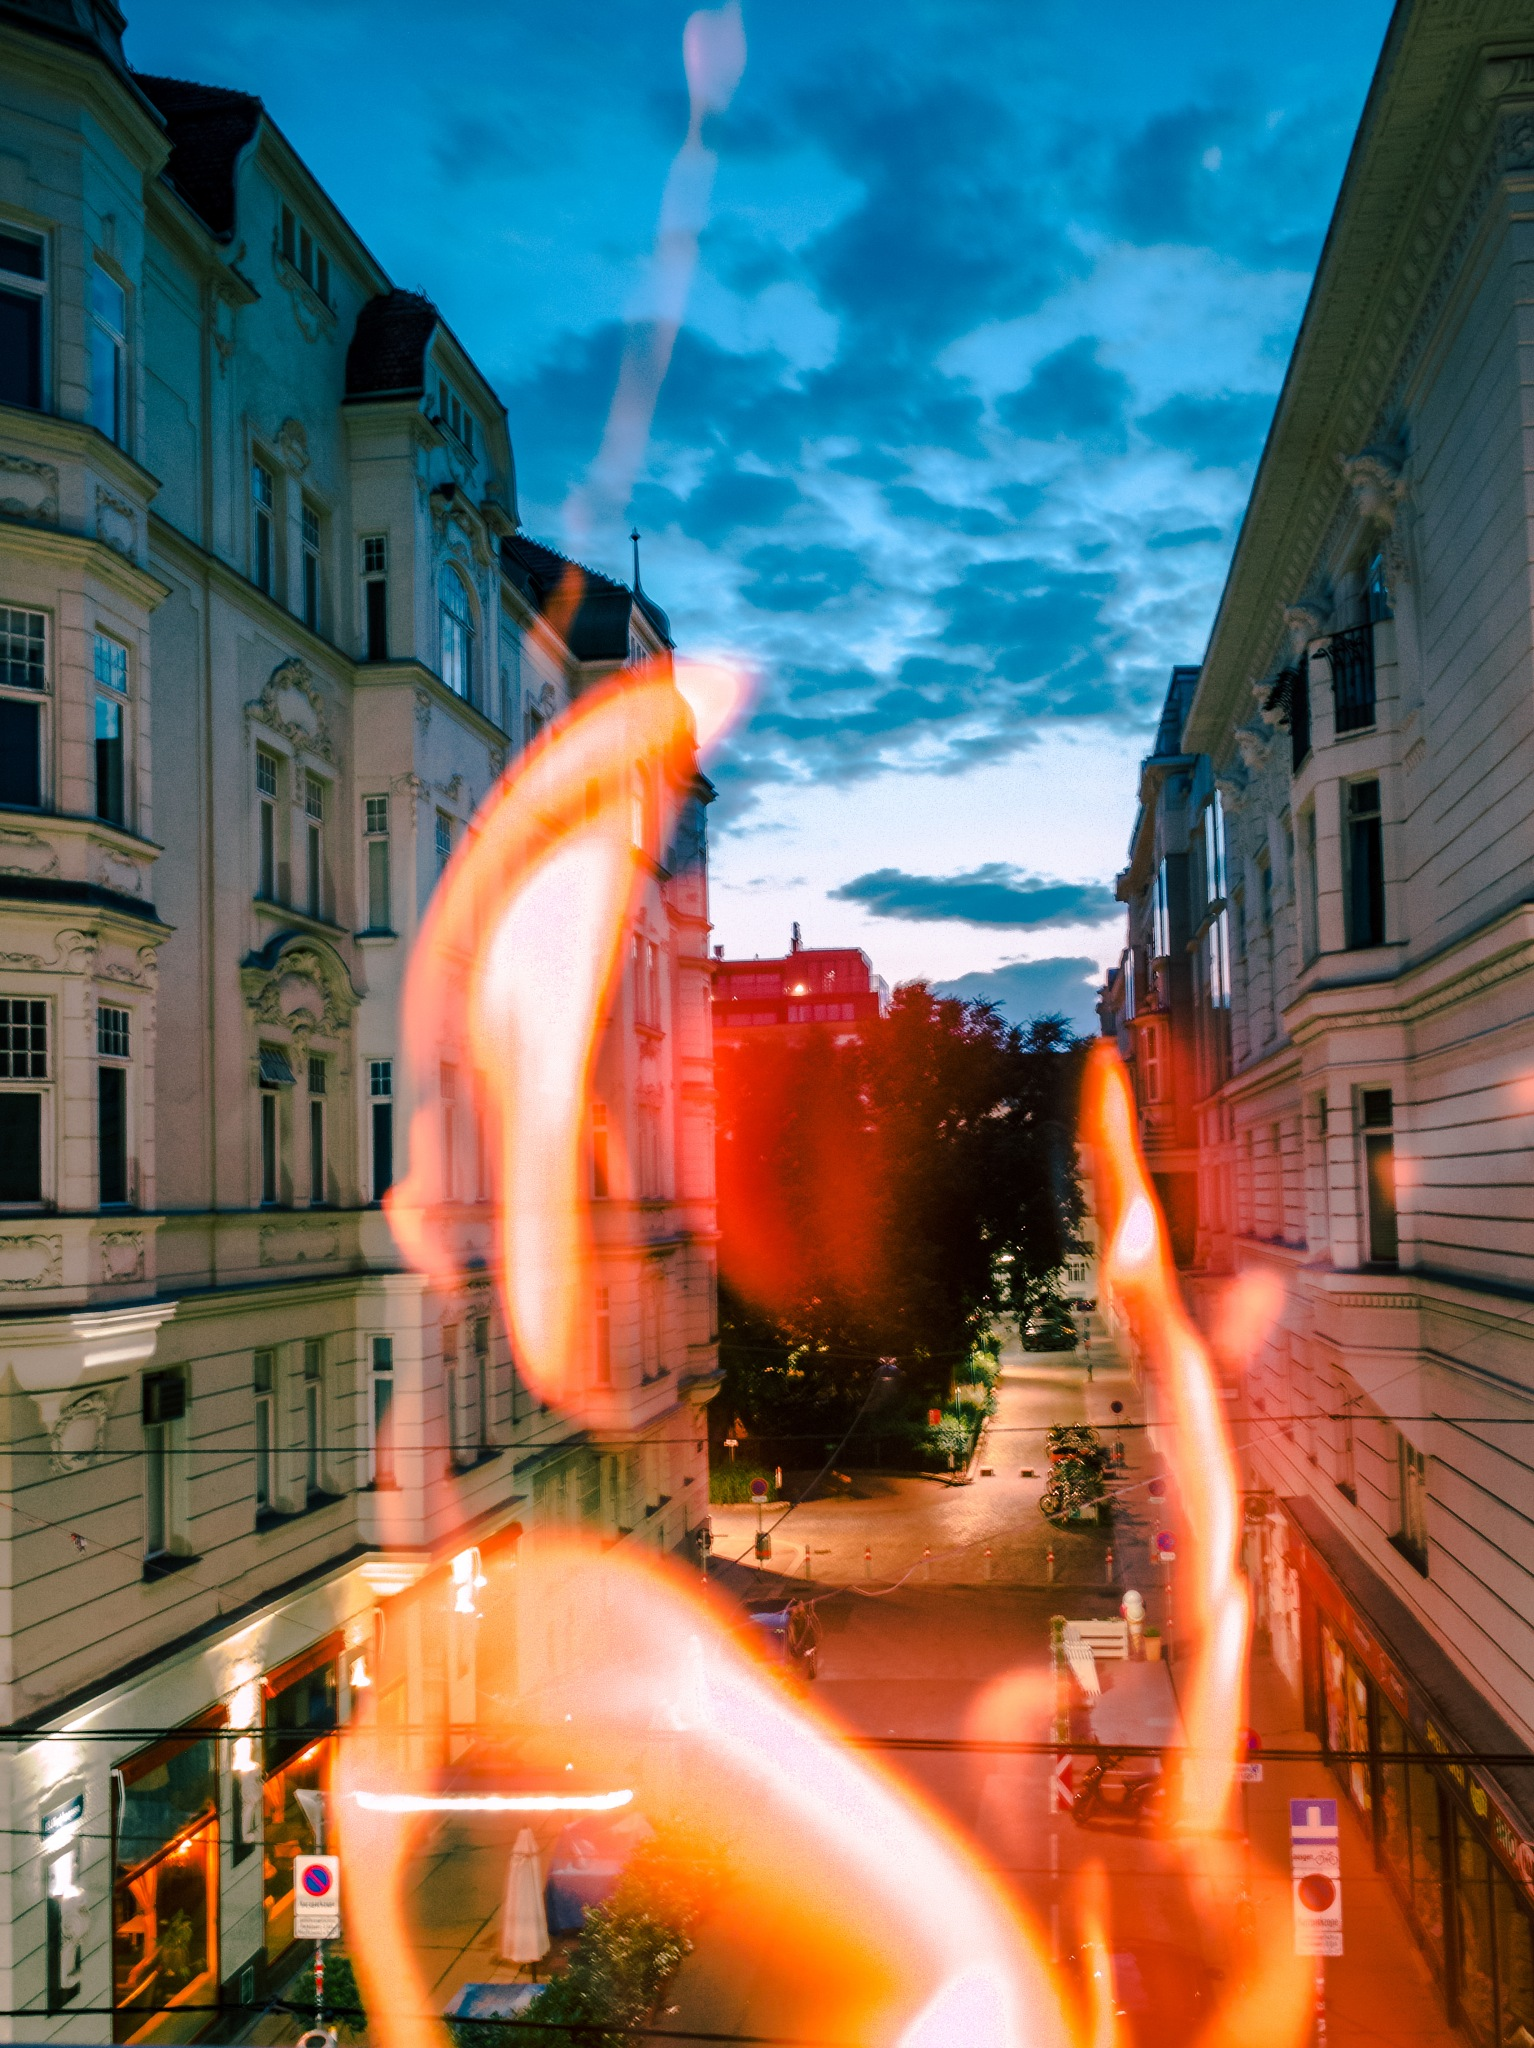 Long Exposure Flames  by Marcel Hess